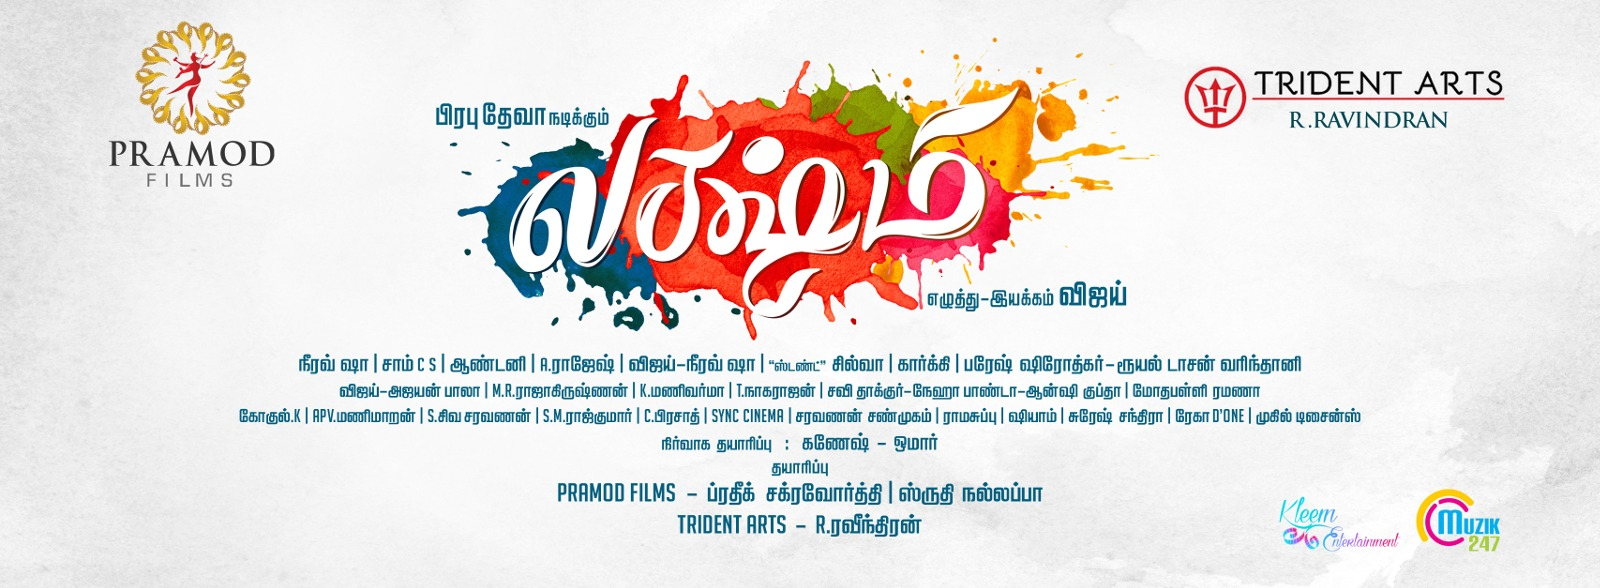 vijay prabhu deva lakshmi movie title poster